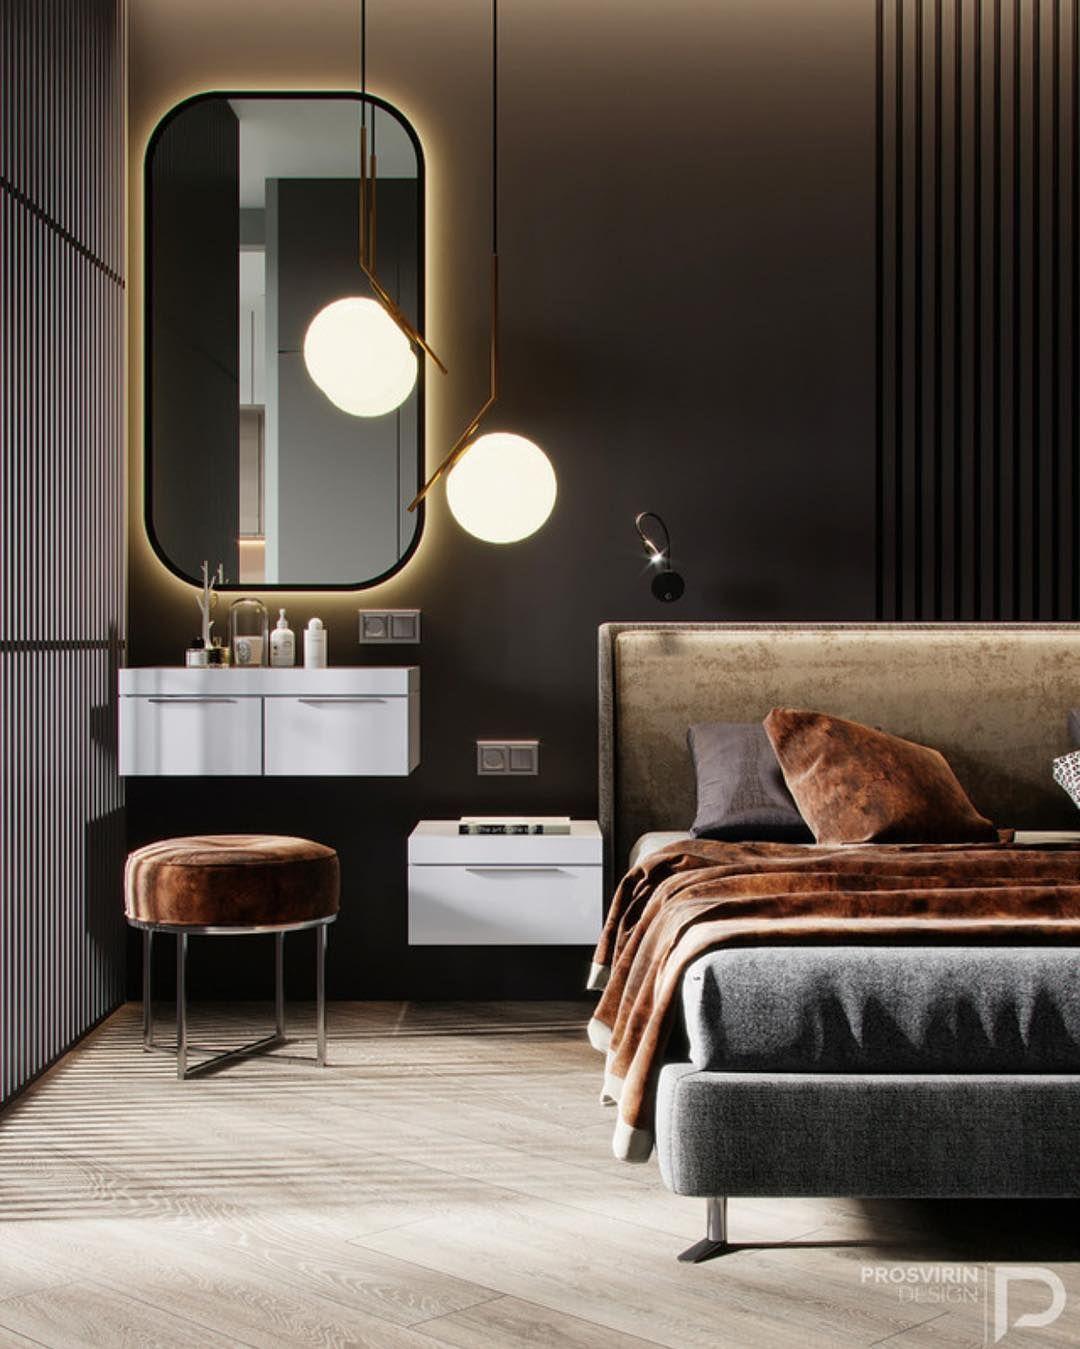 Mid Century Furniture Hotel Bedroom Design Home Room Design